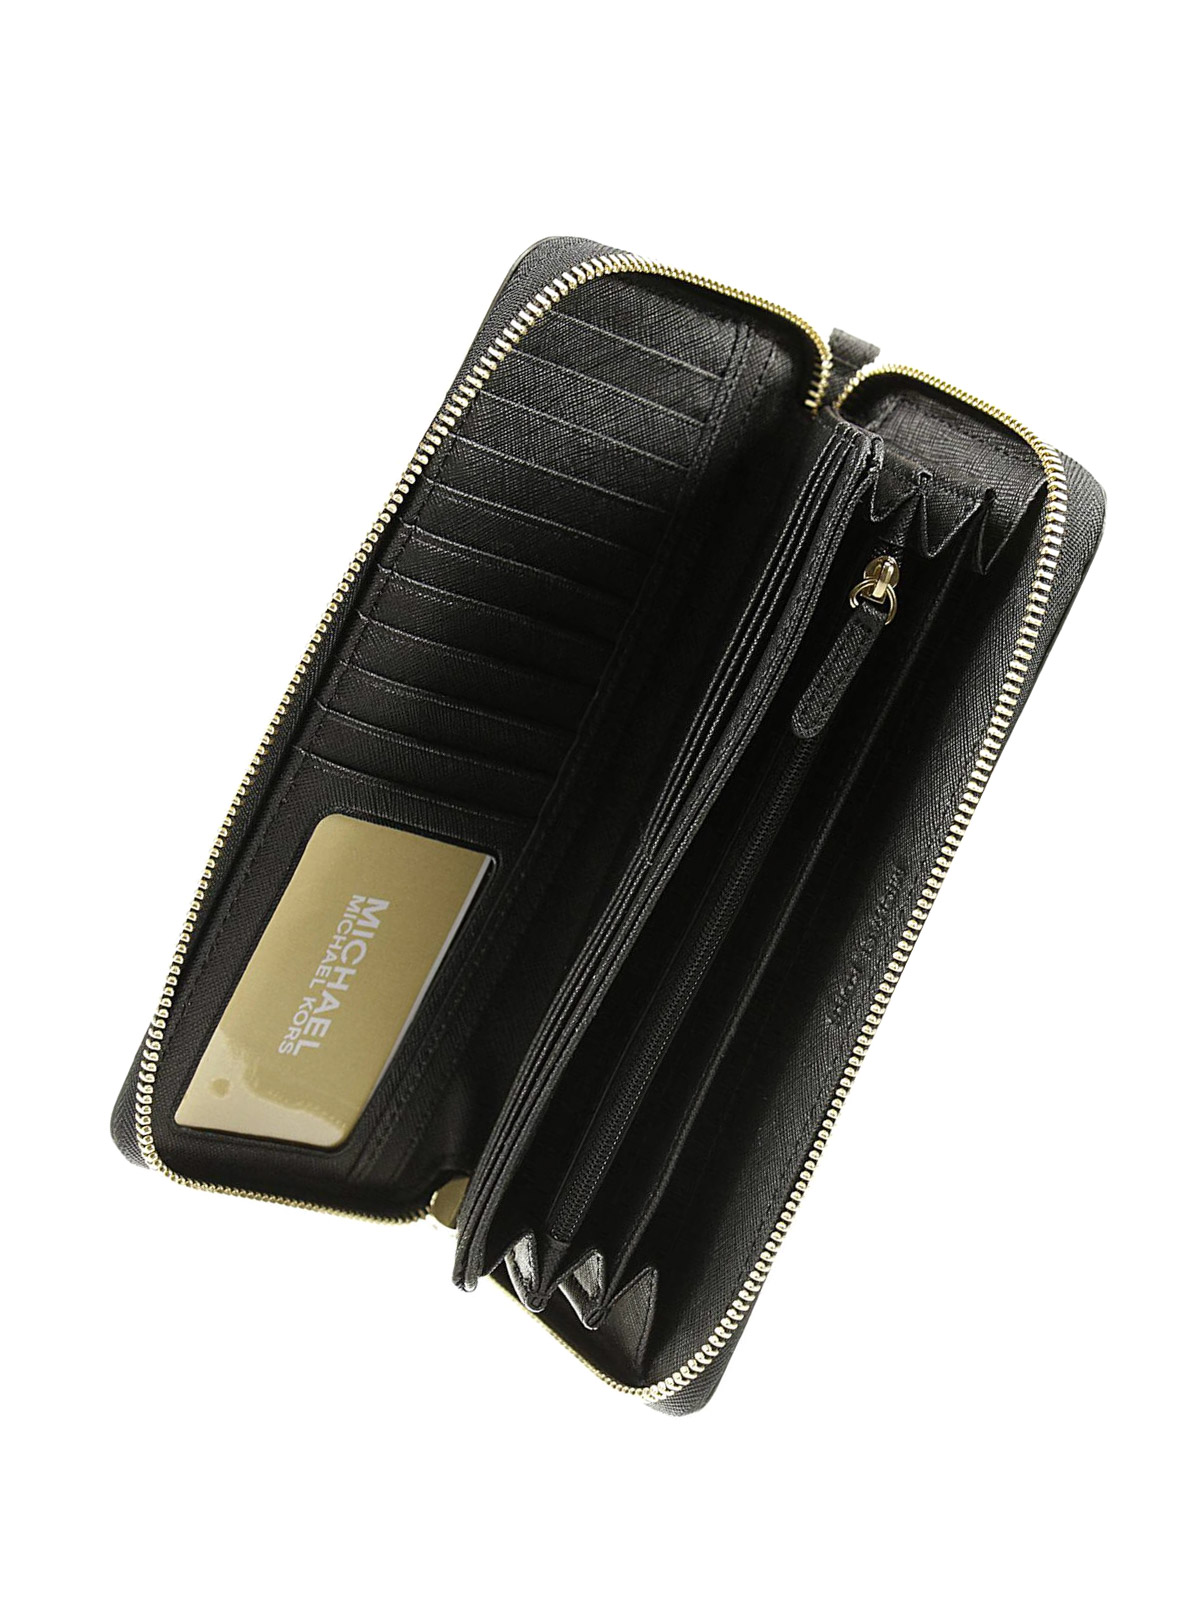 c2ab01660947 MICHAEL KORS: wallets & purses online - Jet Set Travel continental wallet